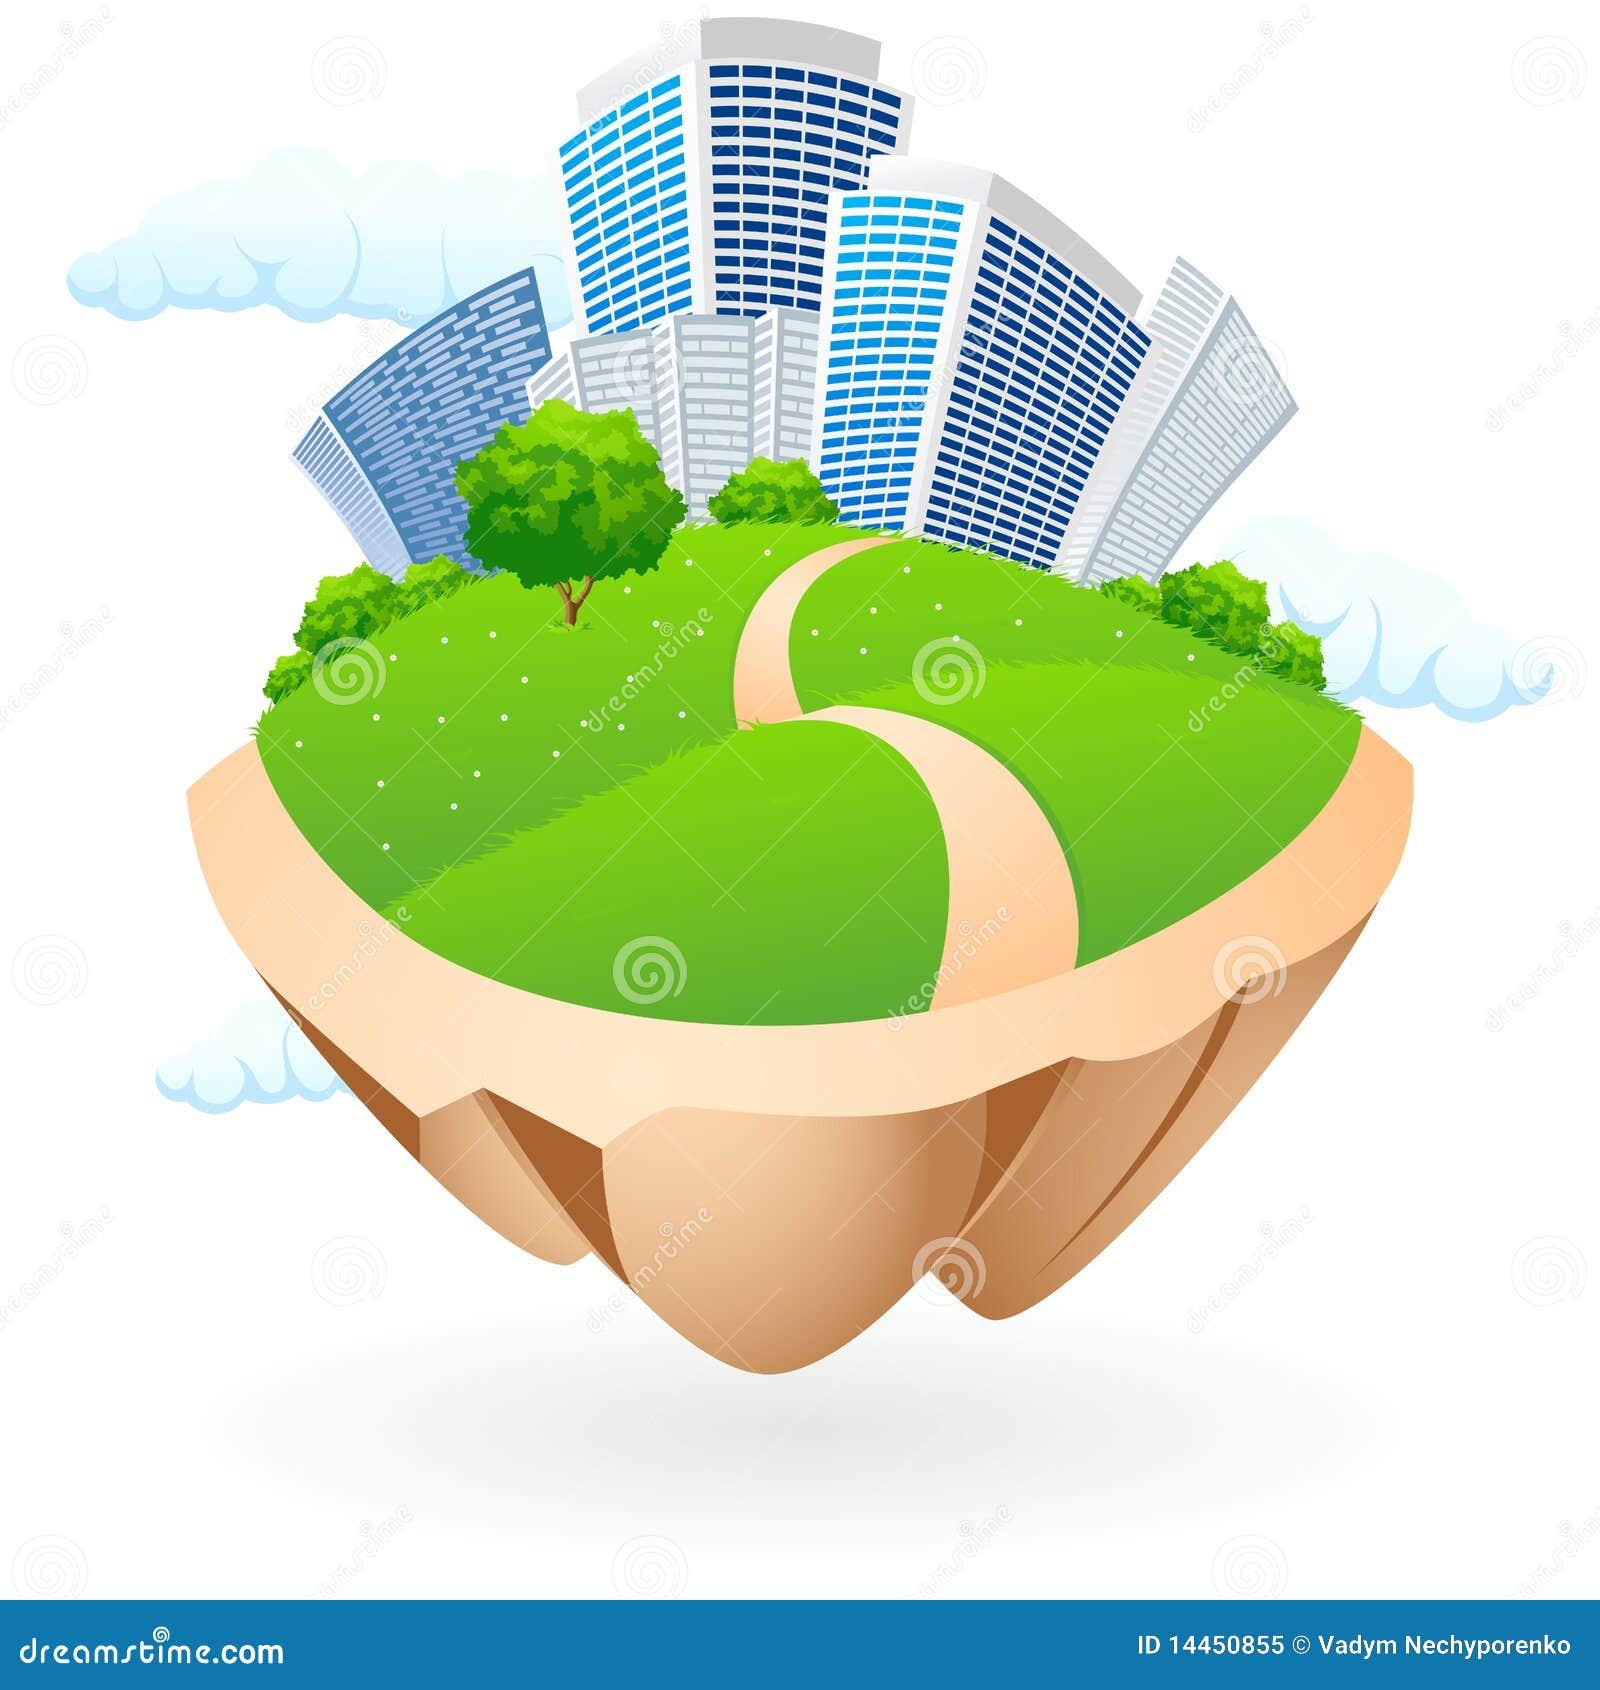 City Icon Royalty Free Stock Photo - Image: 14450855